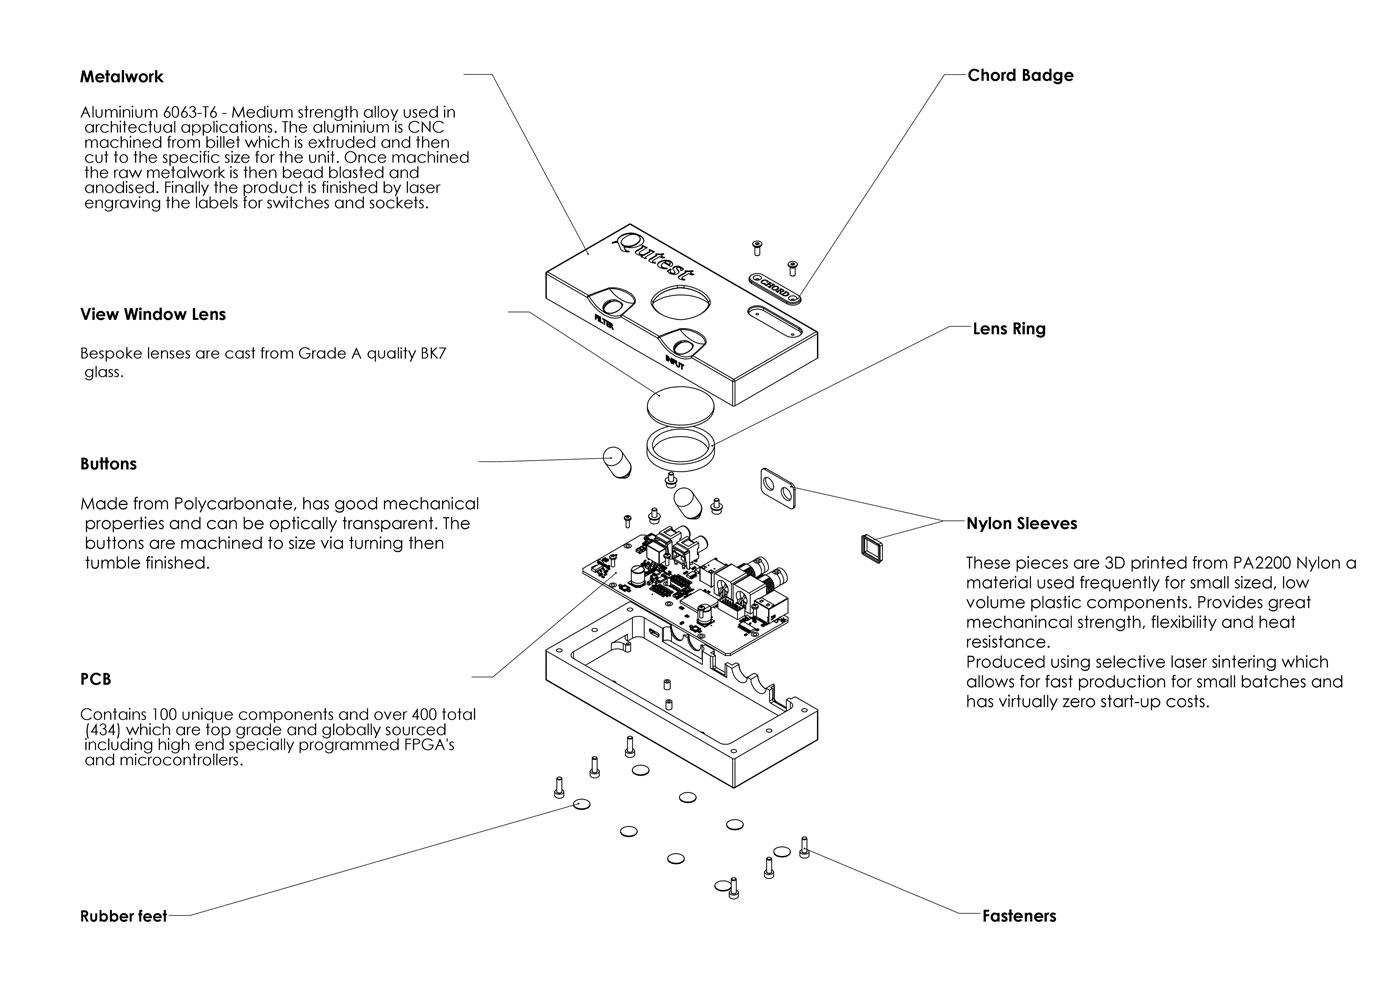 Chord Electronics Qutest Breakdown